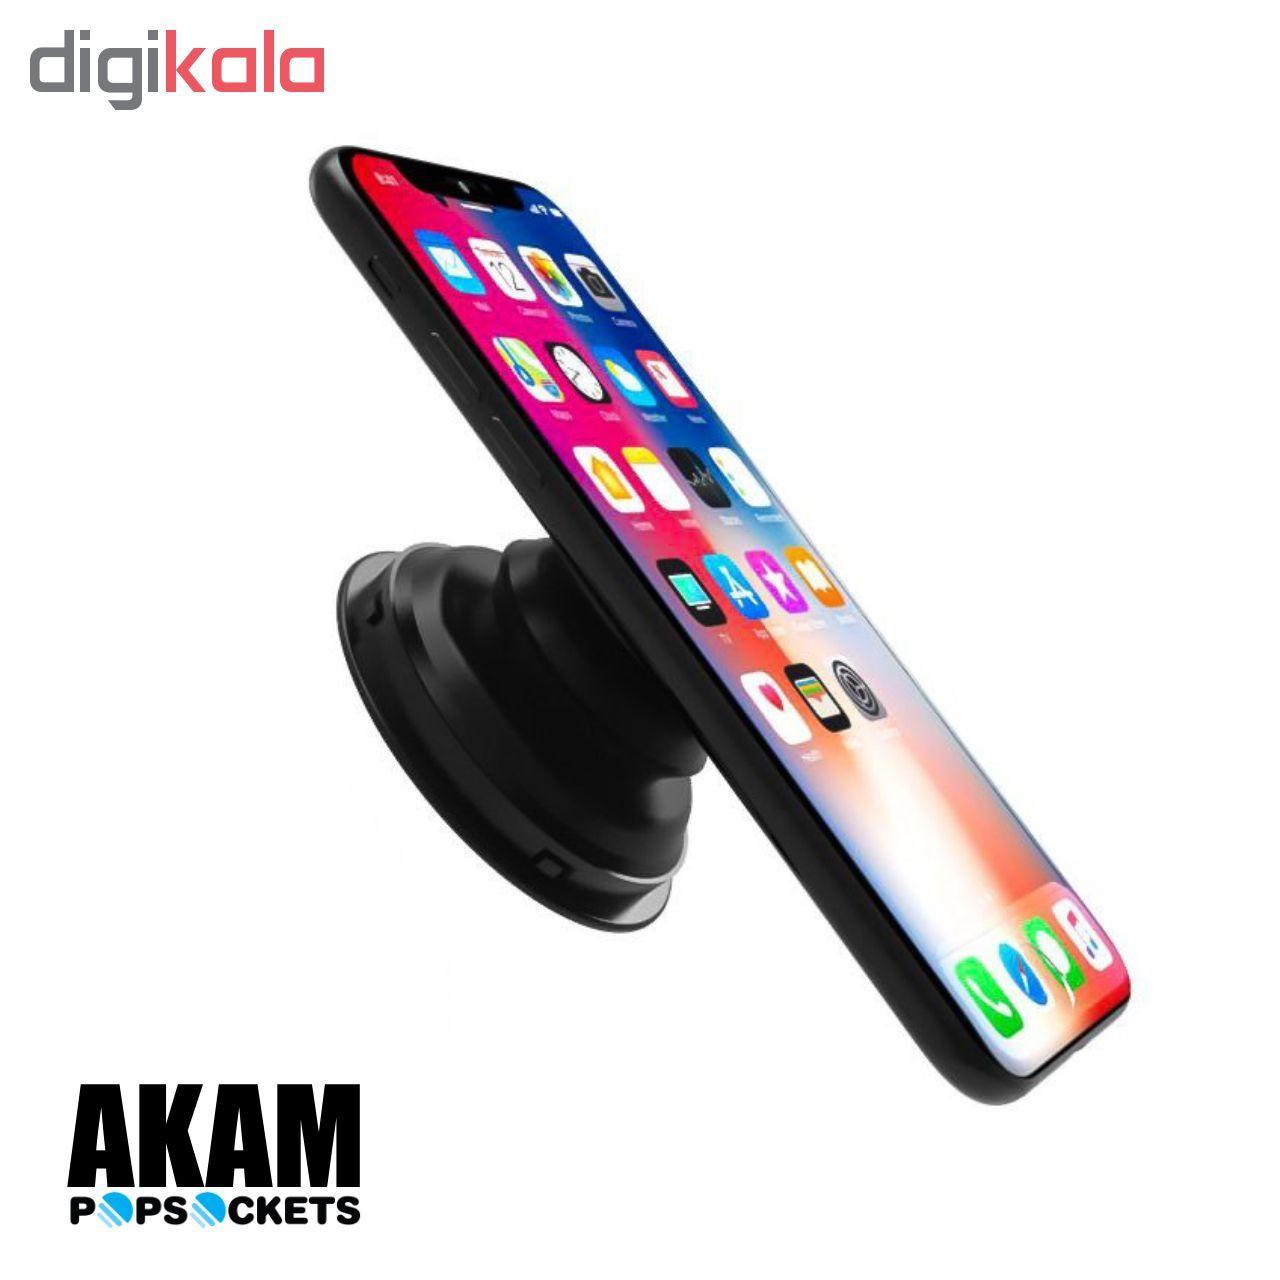 پایه نگهدارنده گوشی موبایل پاپ سوکت آکام مدل APS0111 main 1 7